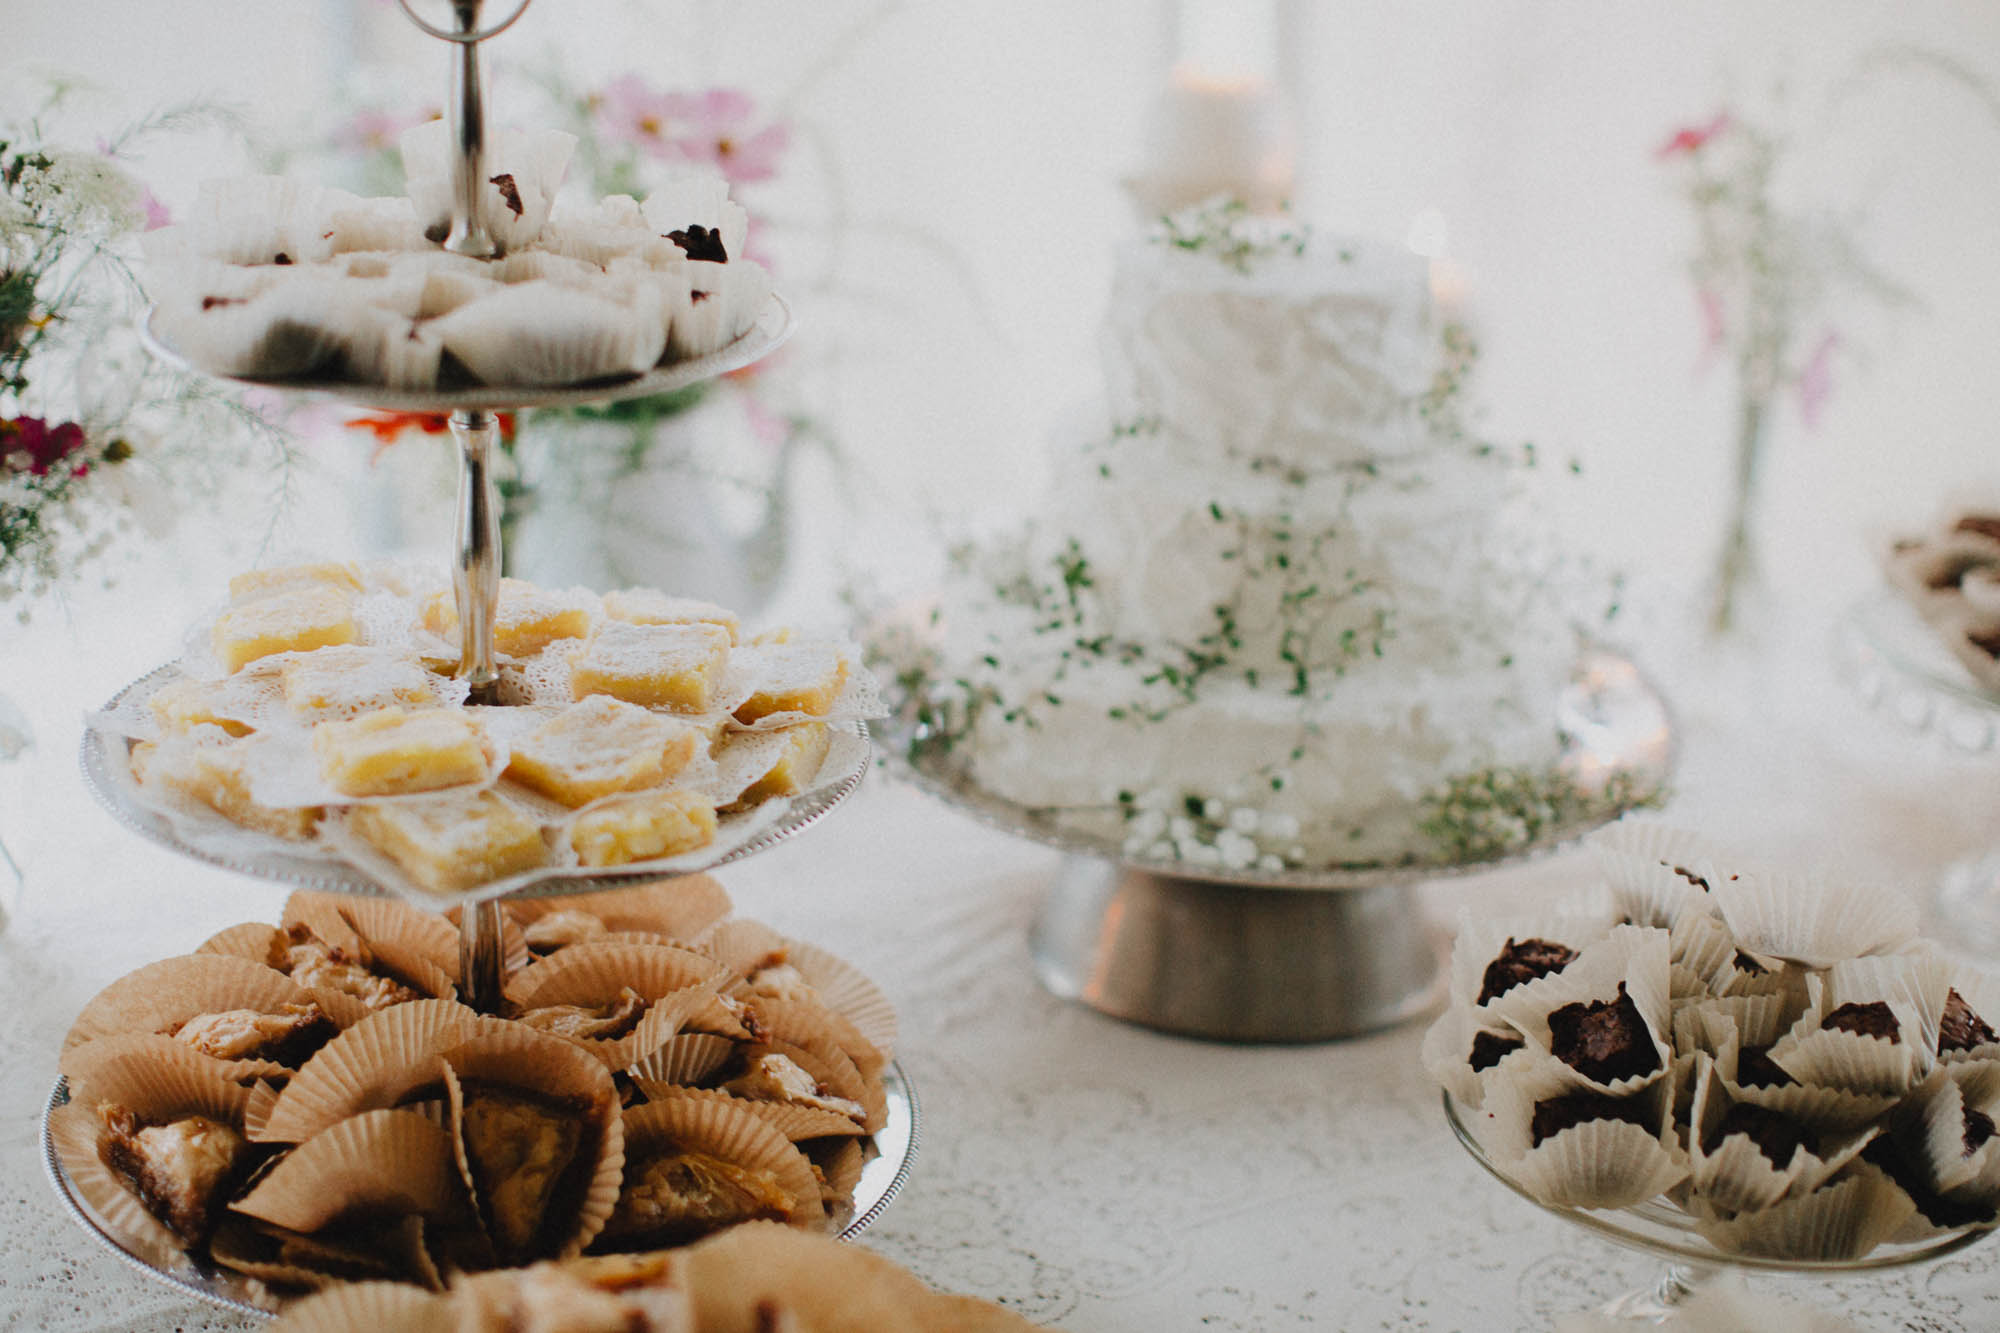 Leah-Graham-Michigan-Outdoor-DIY-Wedding-060@2x.jpg